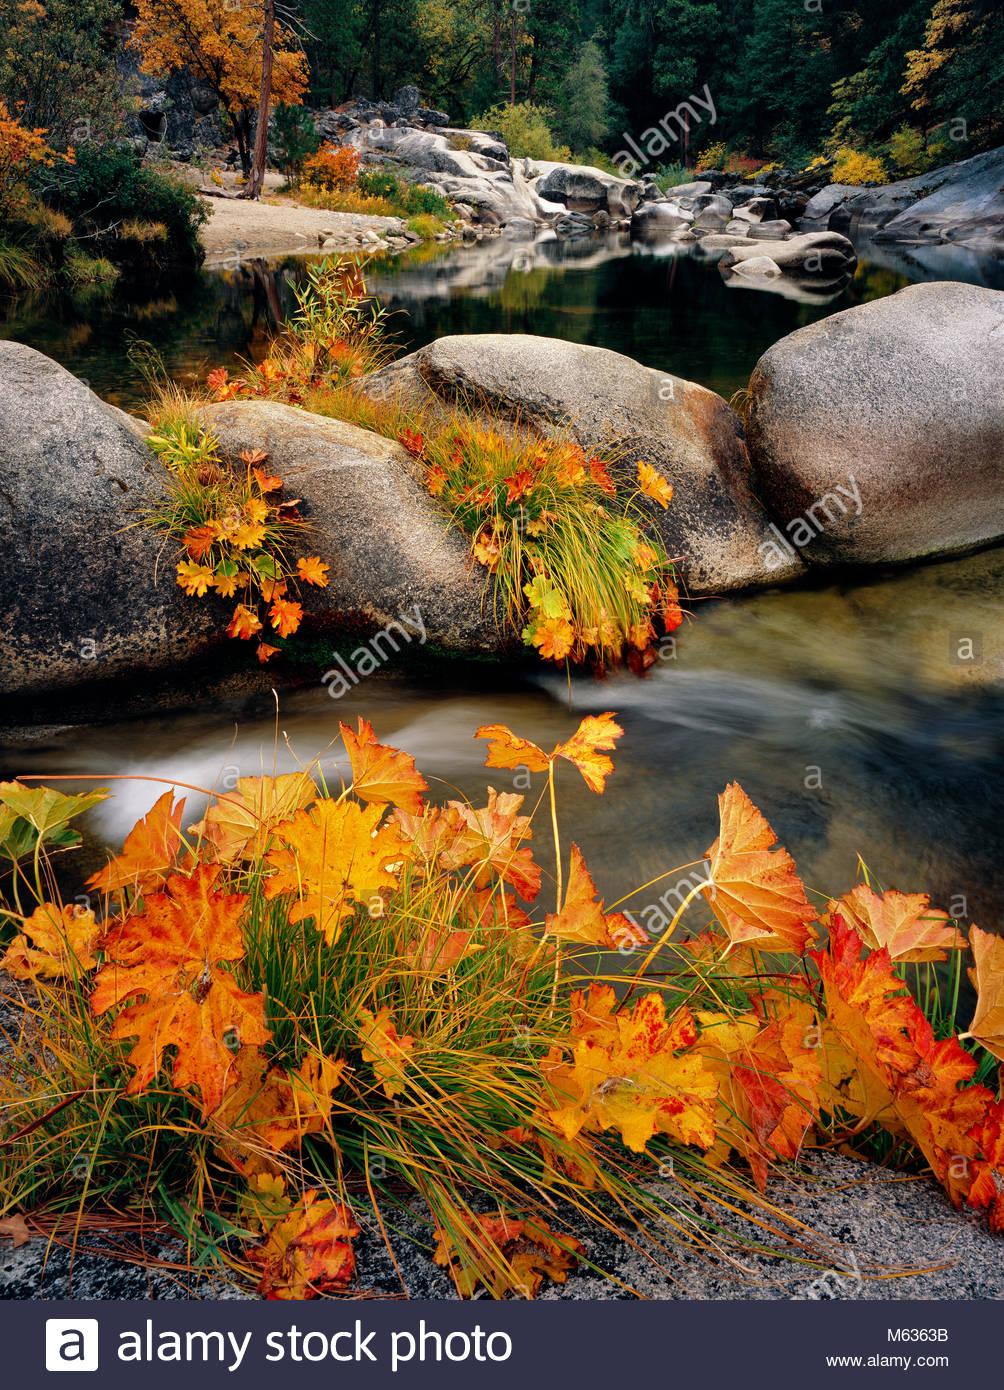 Indian Rhubarb, Merced River, Yosemite National Park, California - Stock Image